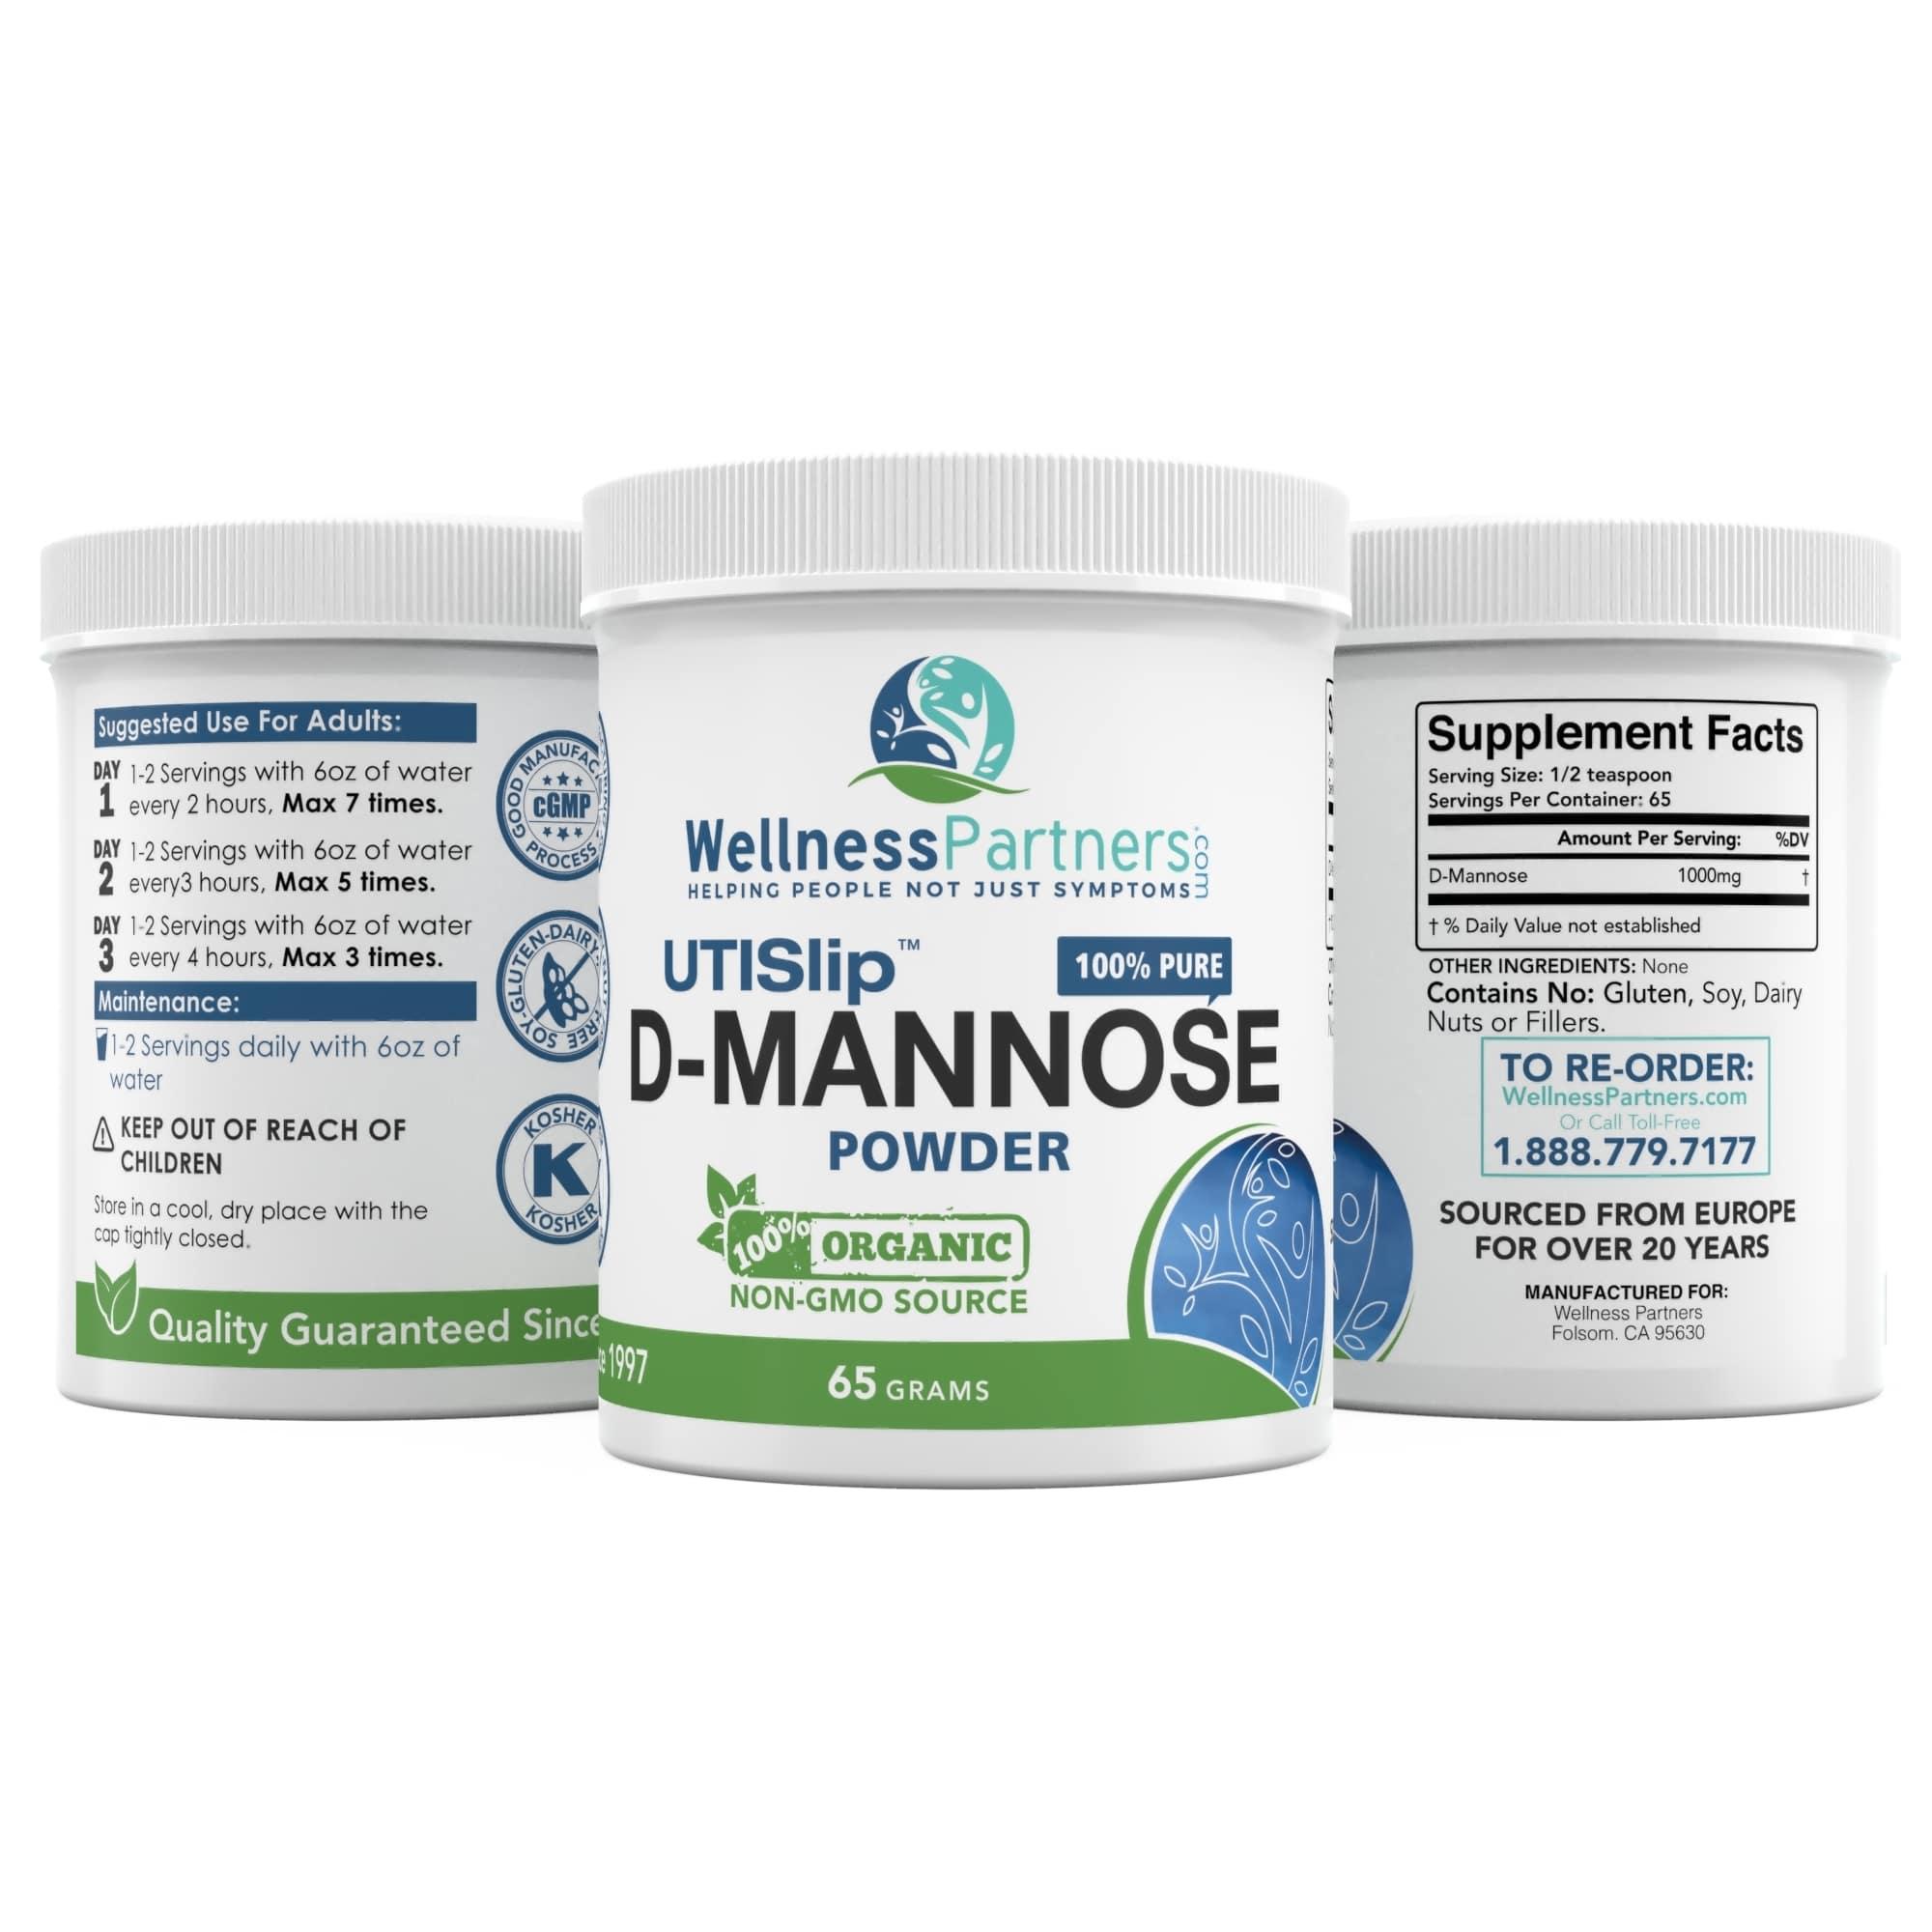 UTI Slip D-Mannose Powder 65g Jar